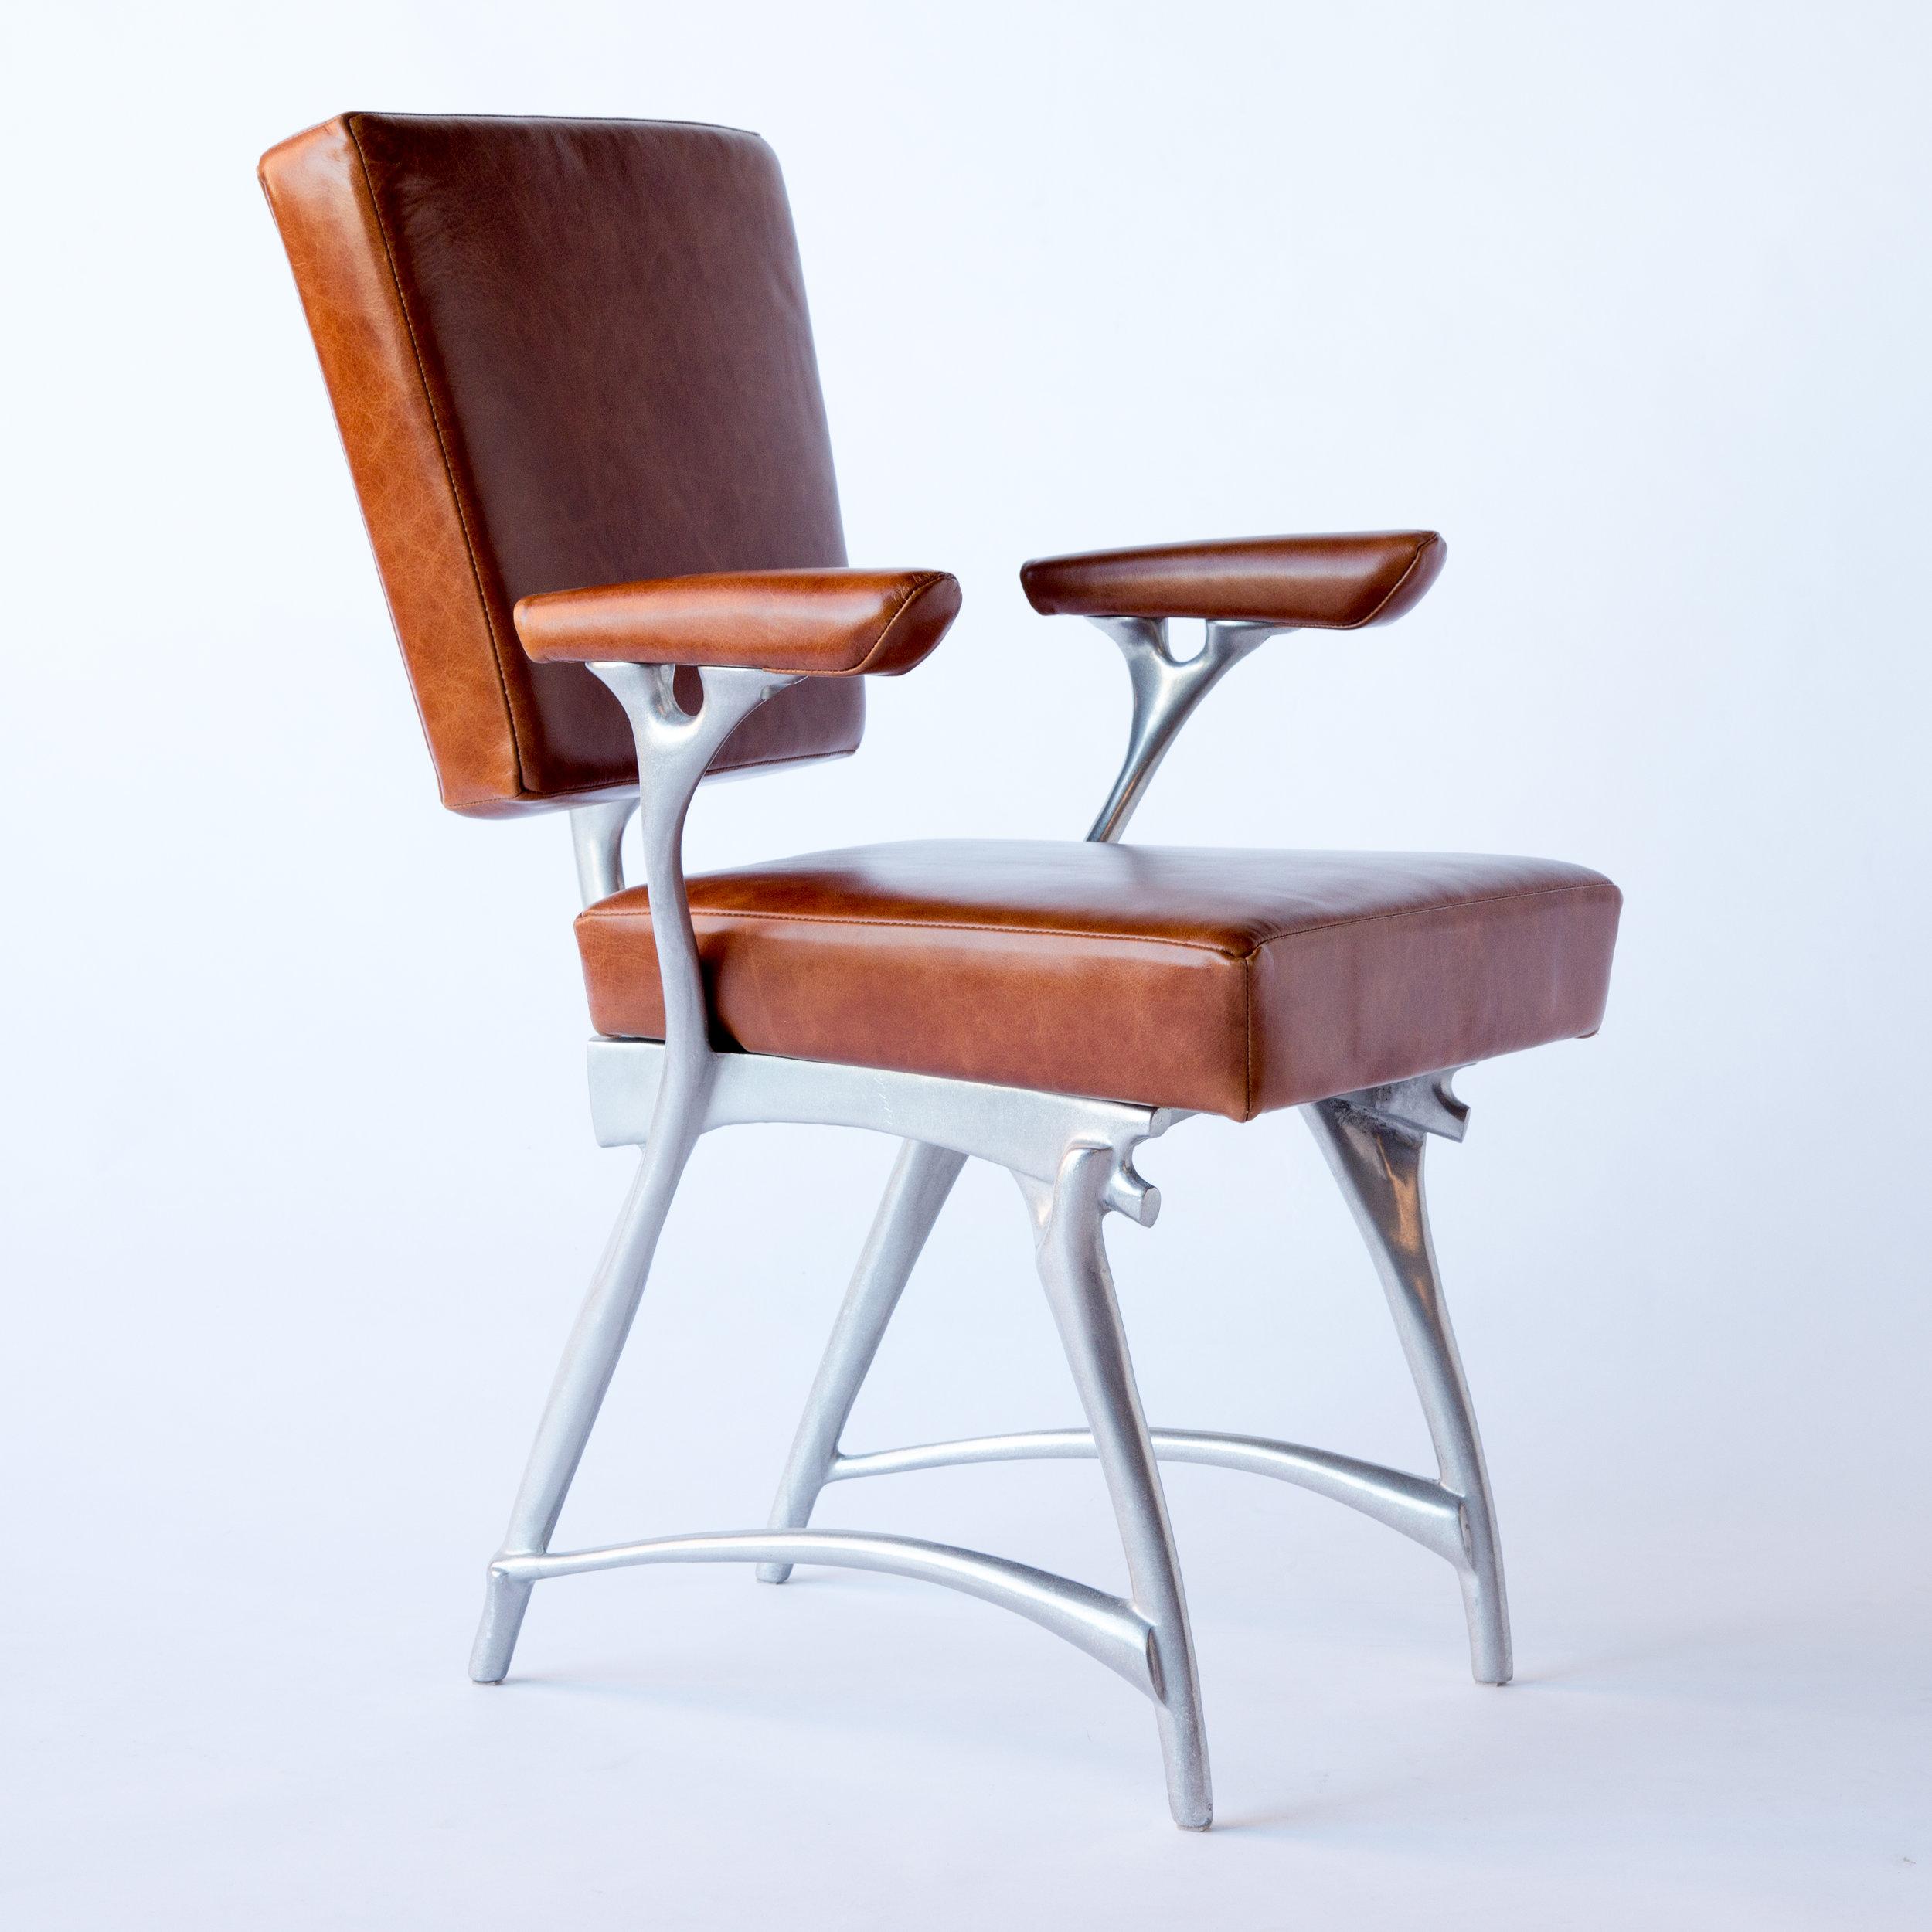 Twig Chair Light-5.jpg